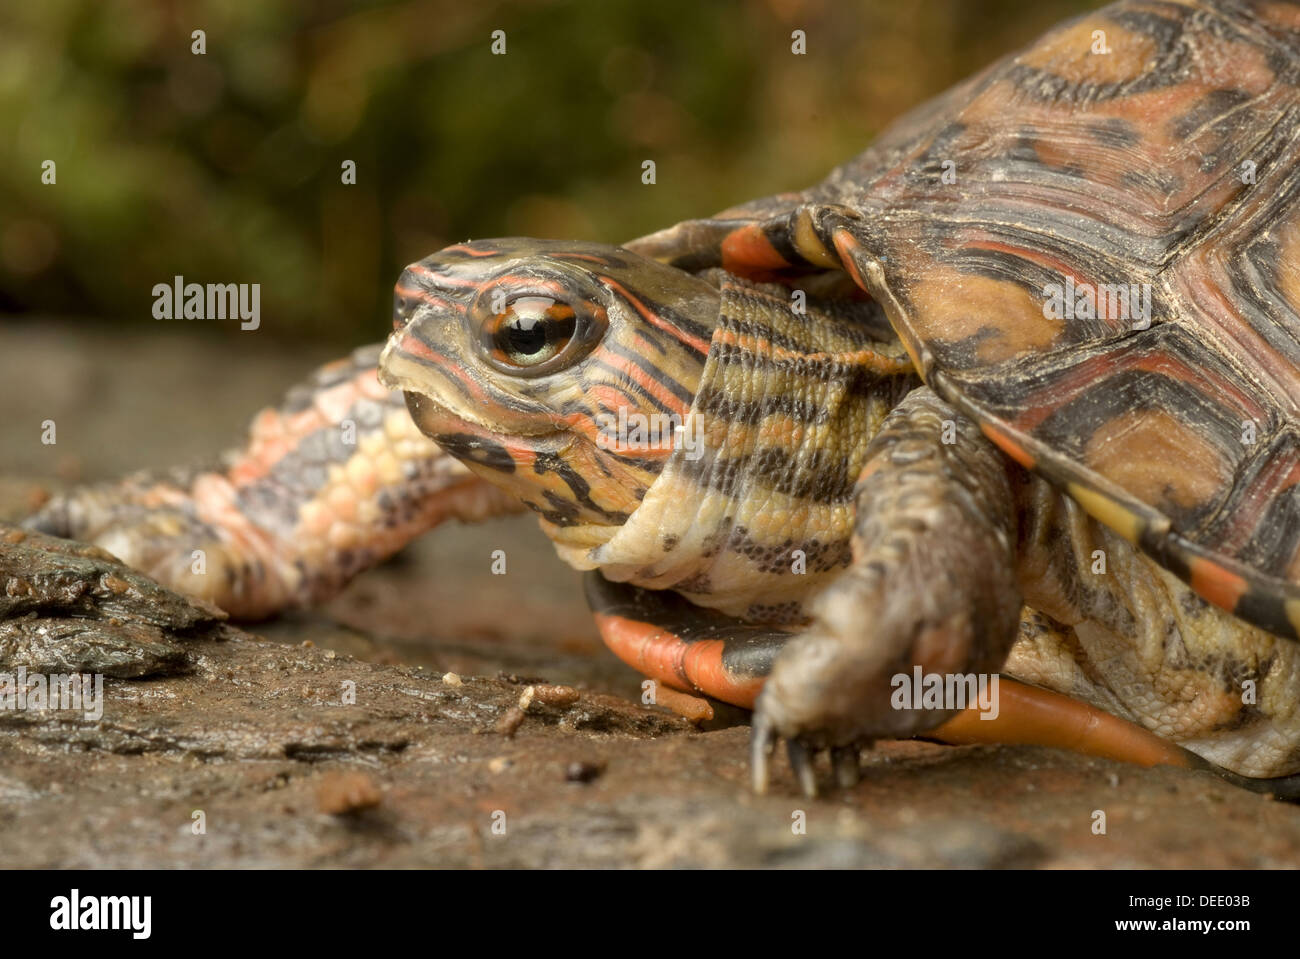 Costa Rica Ornate wood turtle, Rhinoclemmys pulcherrima manni - Stock Image